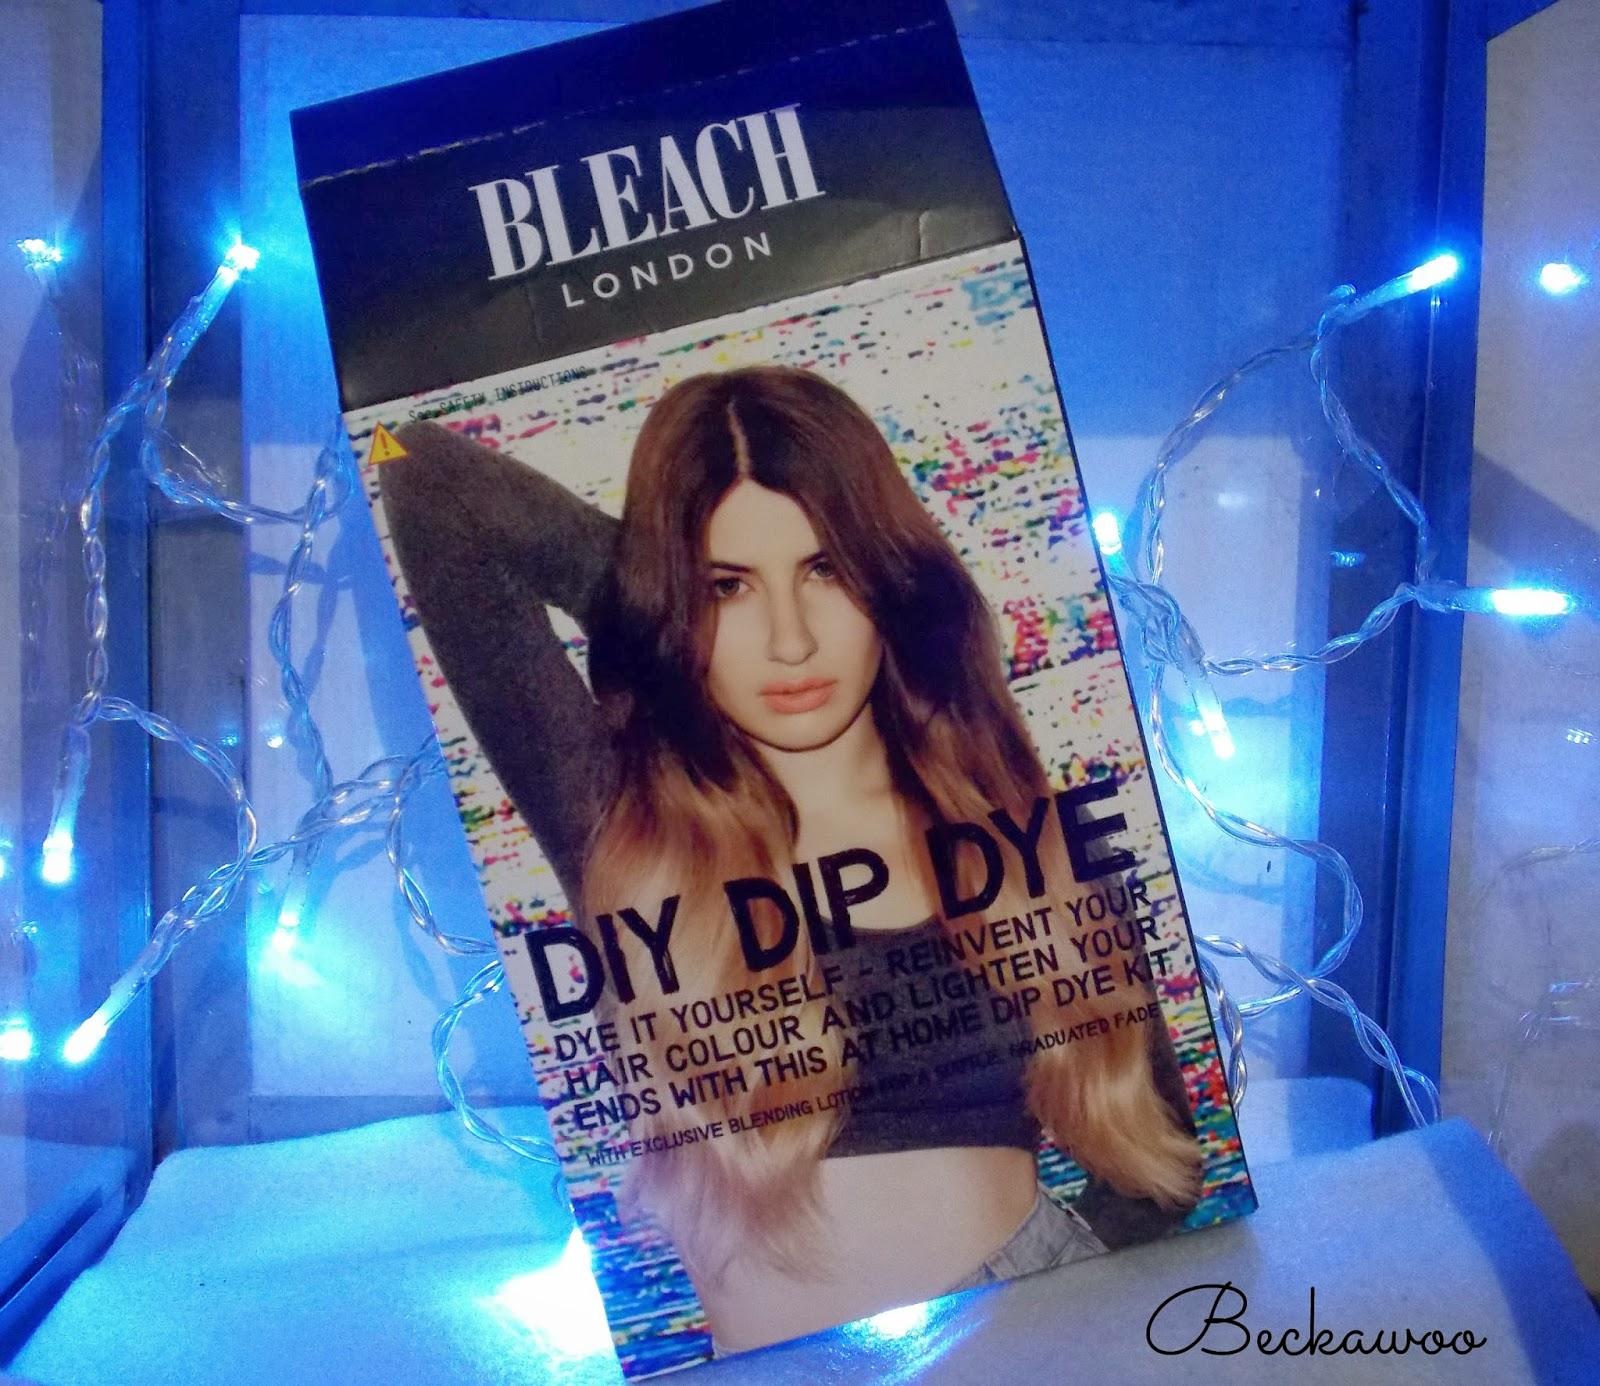 Review tutorial bleach london diy dip dye beckawoo review tutorial bleach london diy dip dye solutioingenieria Choice Image